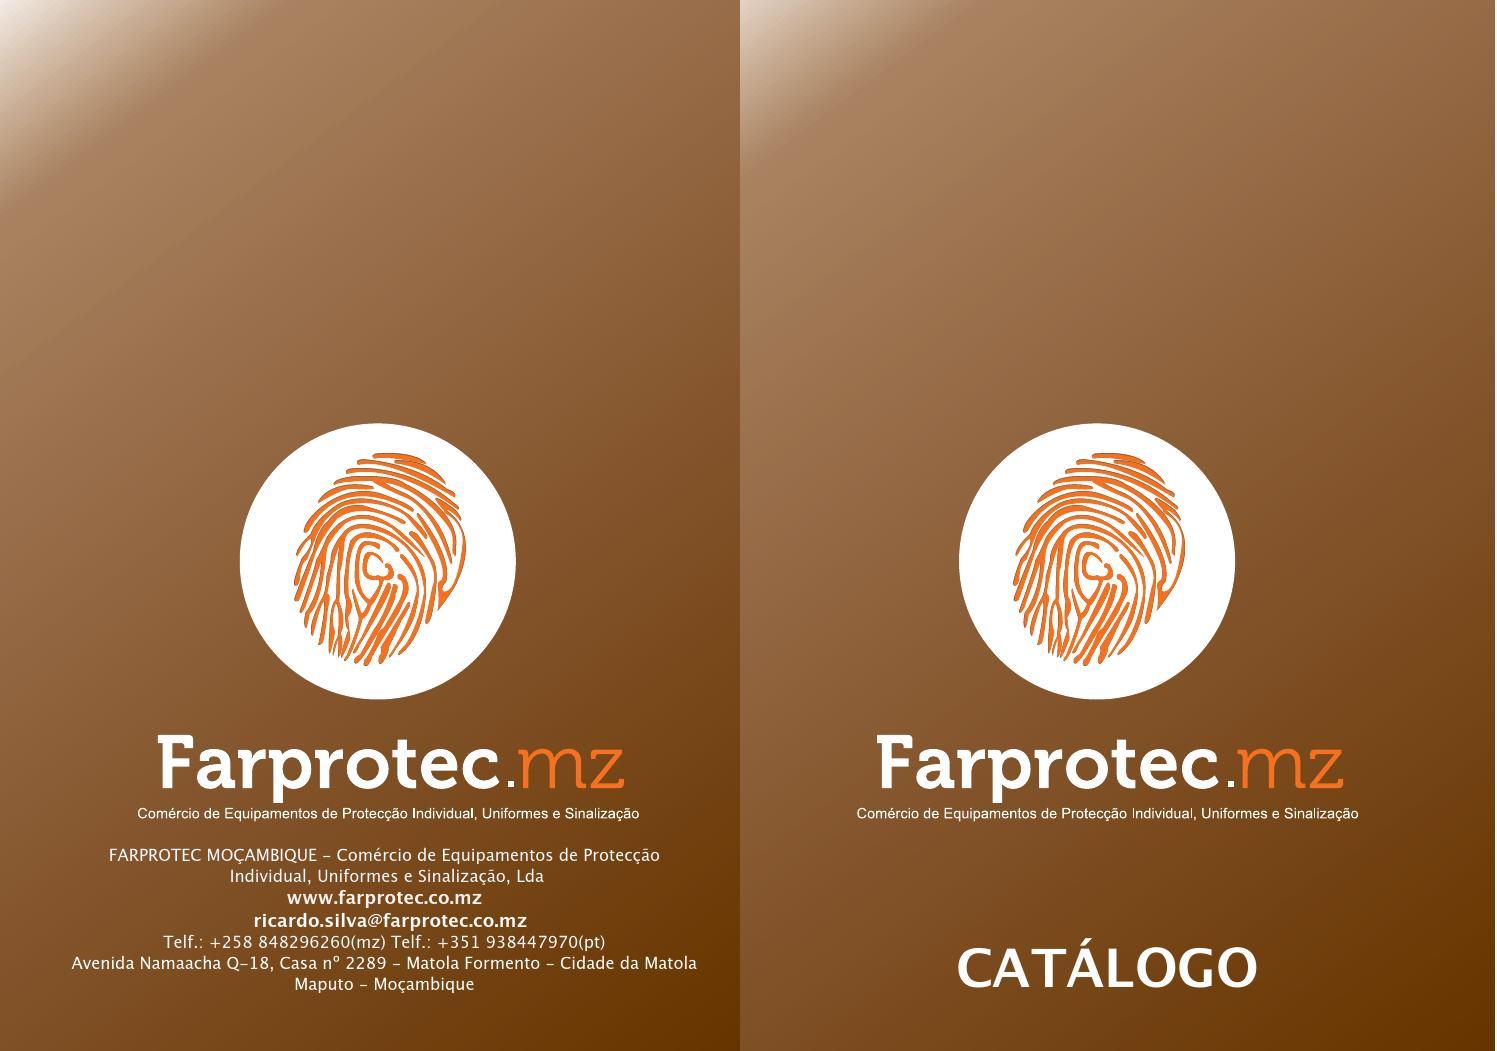 FARPROTEC - Catálogo by Farprotec Mozambique - issuu 93374549dea